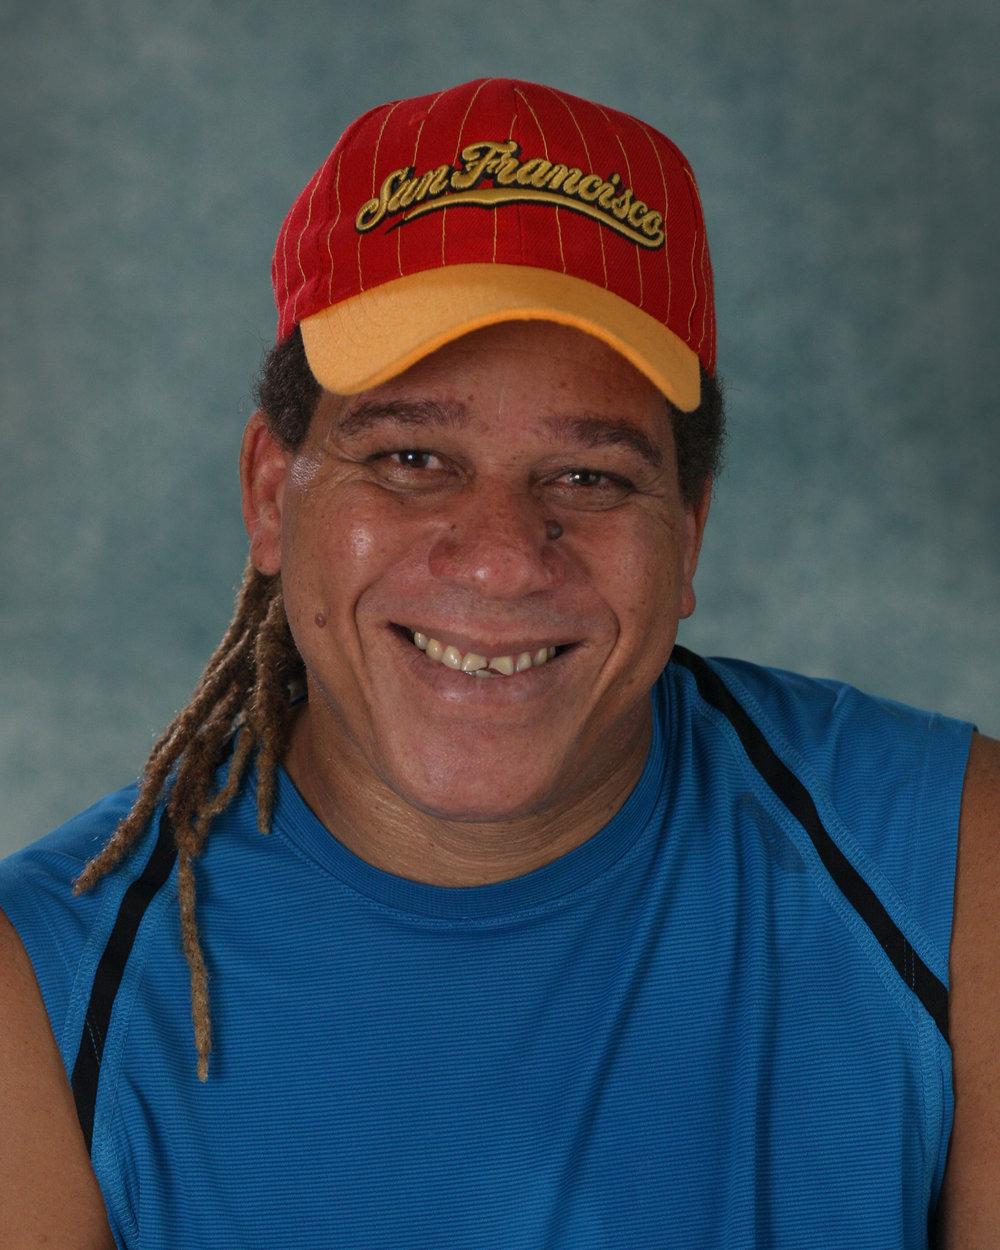 Martin Vidal, Custodian